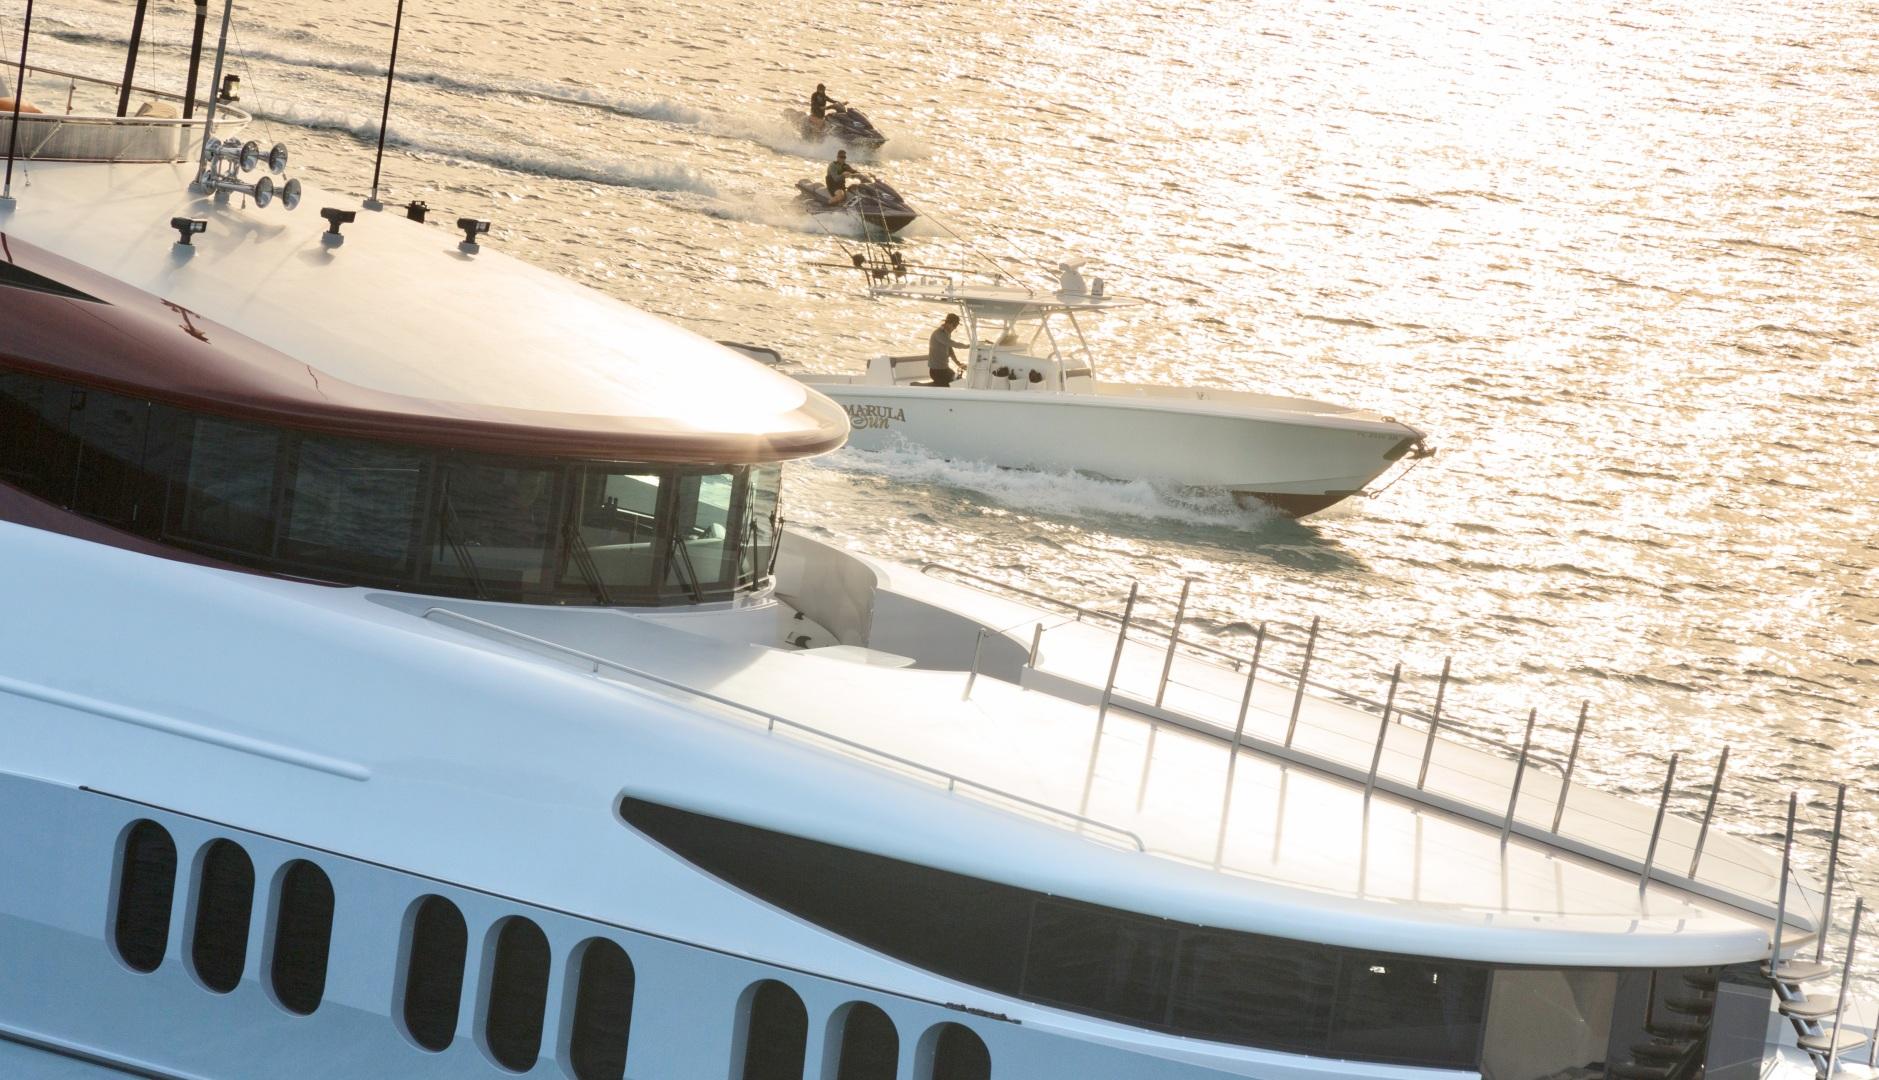 Trinity Yachts-164 Tri-deck Motor Yacht 2008-Amarula Sun Fort Lauderdale-Florida-United States-Exterior View Of Bridge-1513907 | Thumbnail